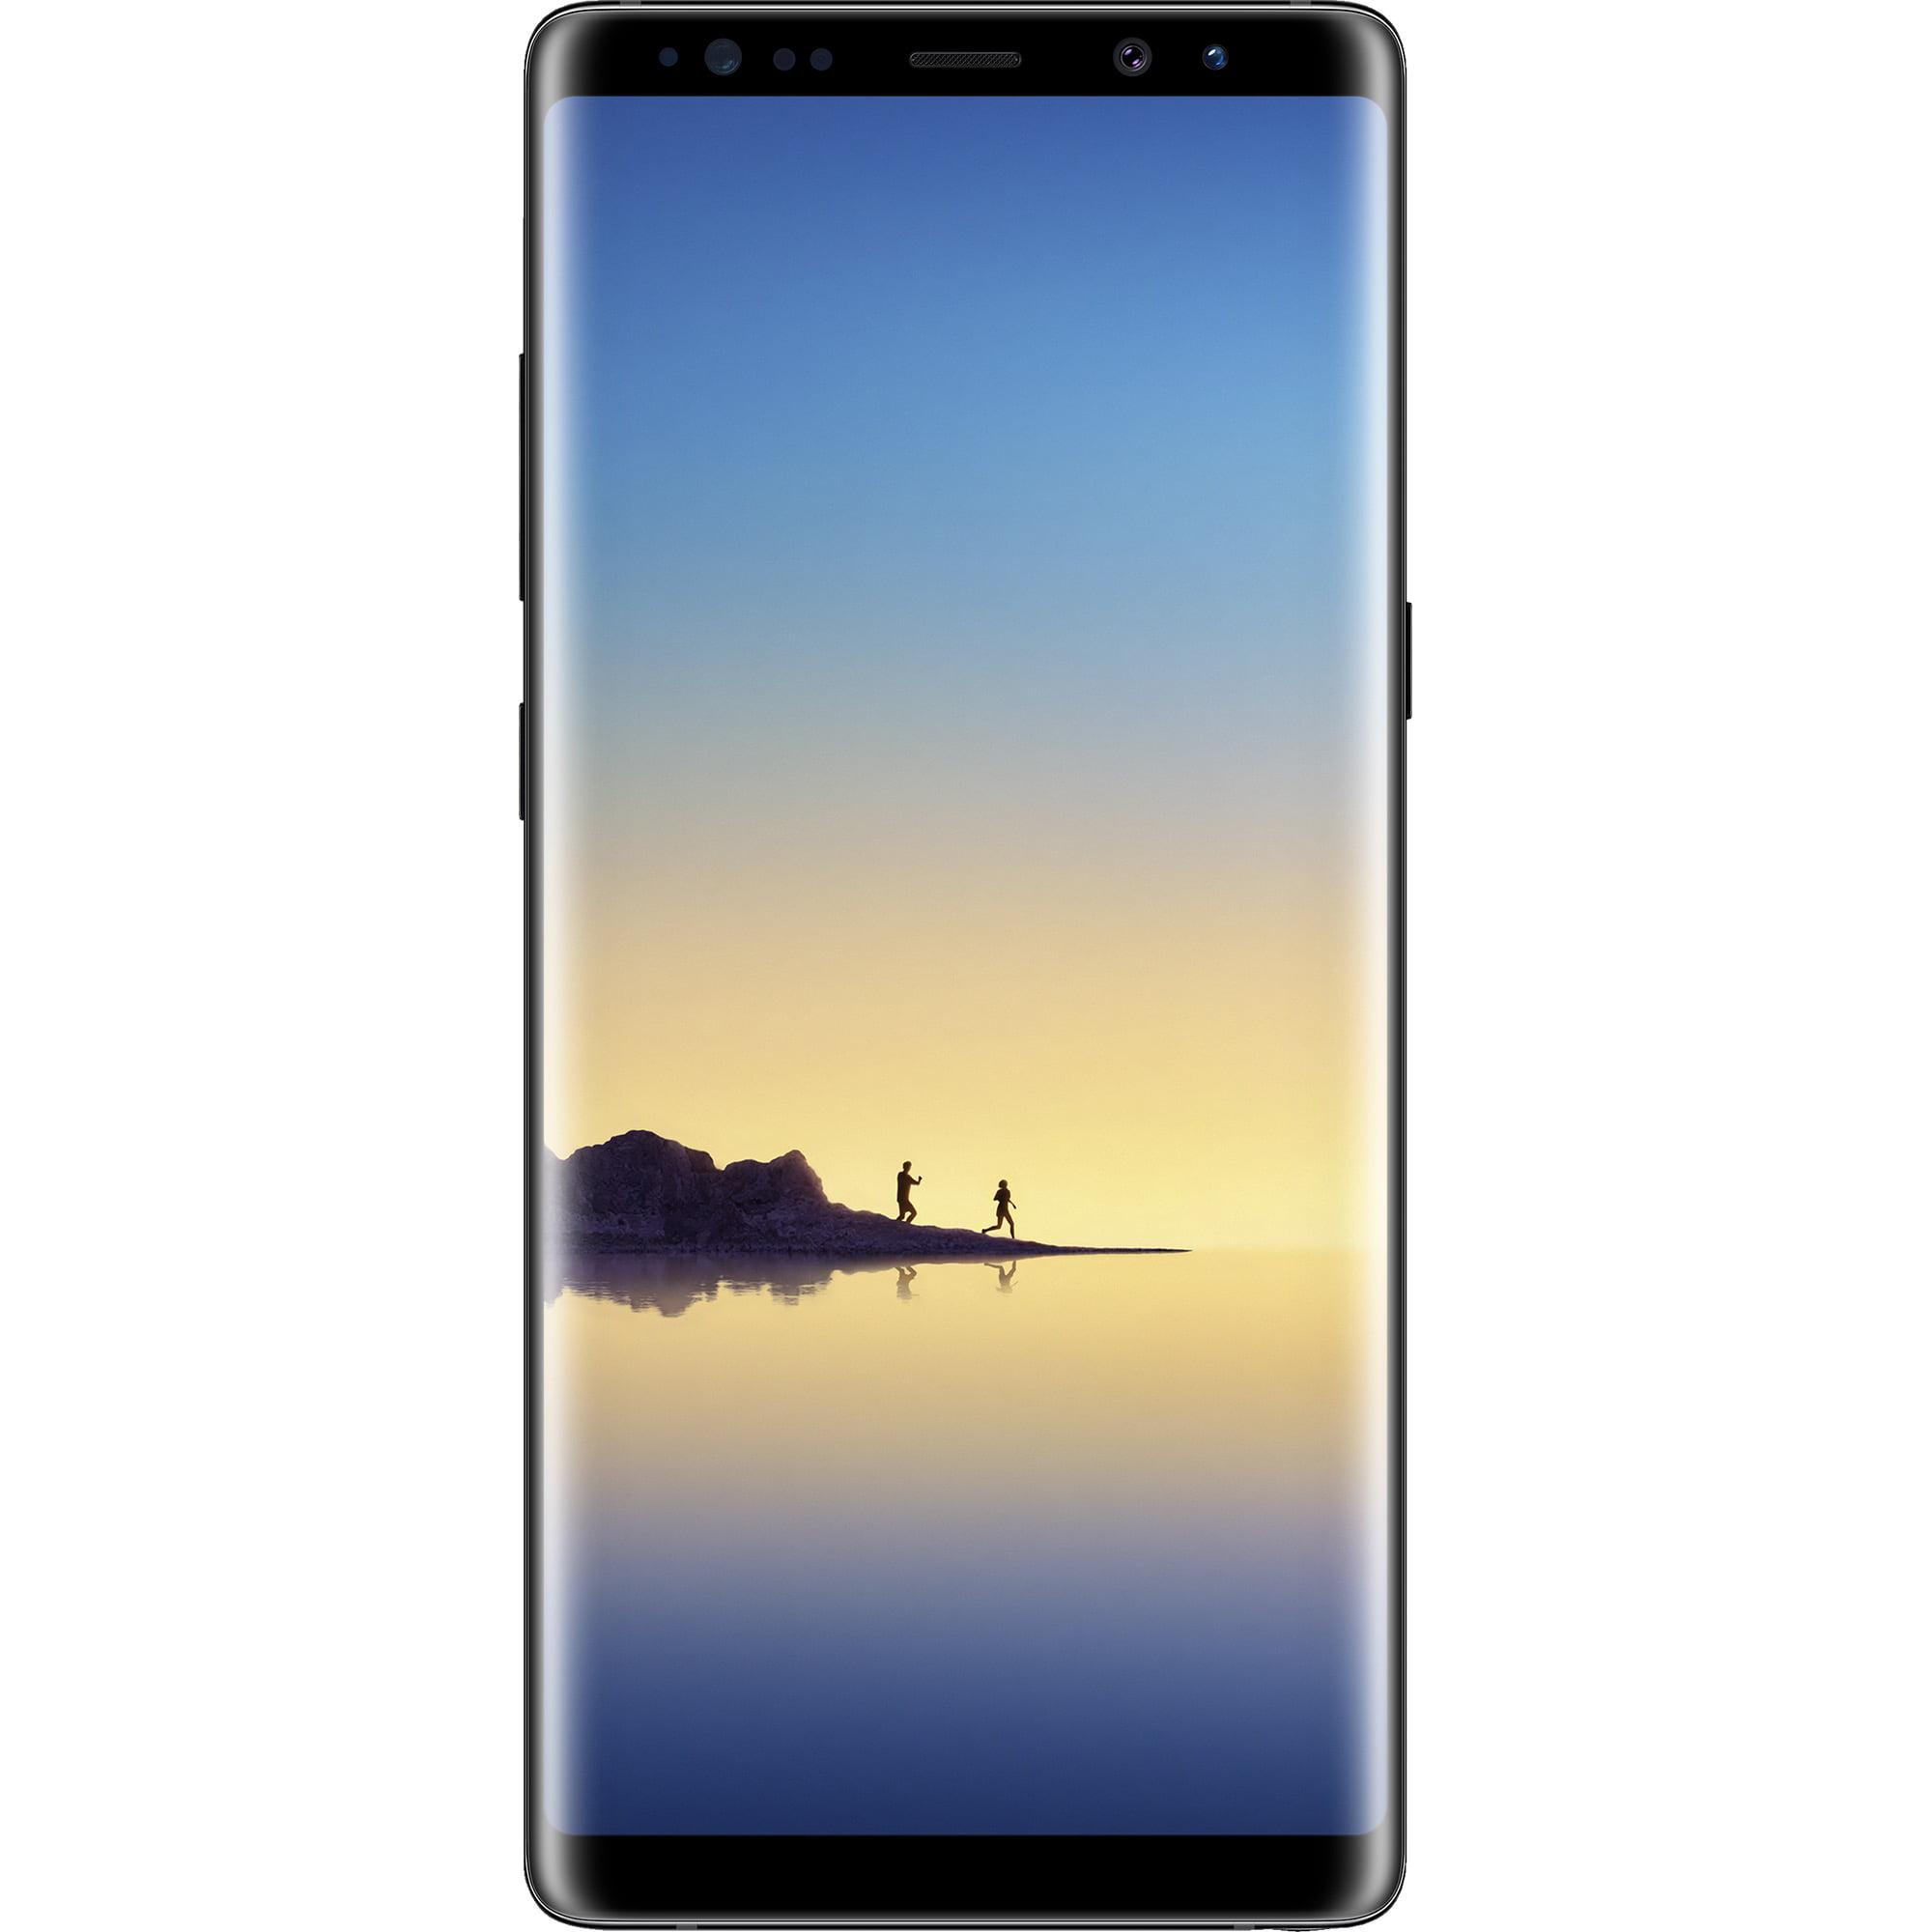 Total Wireless SAMSUNG Galaxy Note 8, 64GB Black - Prepaid Smartphone